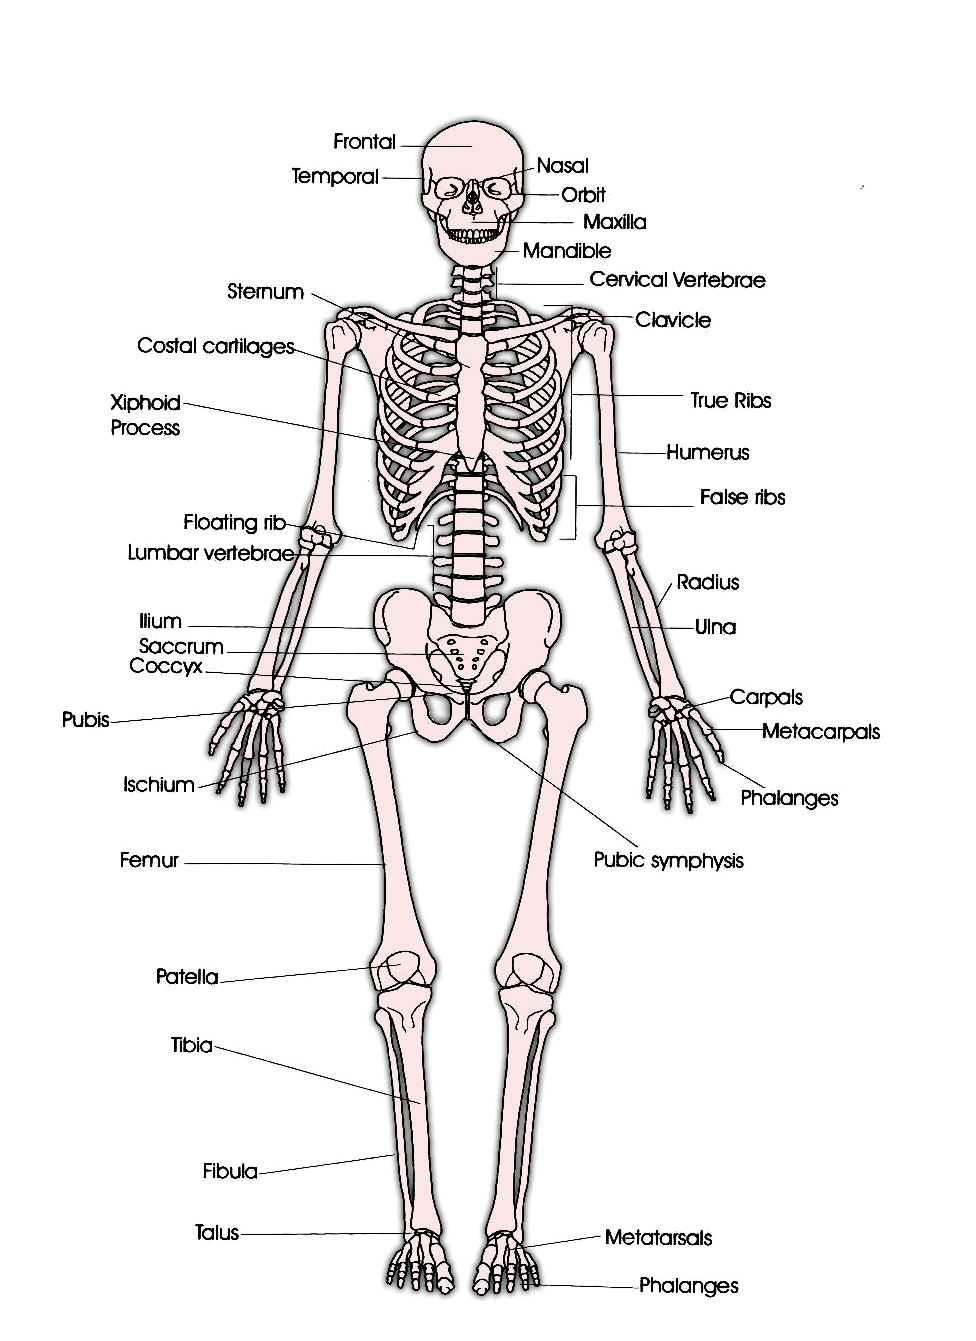 http://4.bp.blogspot.com/--zAwYaBiQ1w/UFKvFCCZJ_I/AAAAAAAAGIE/DROUxksi_mo/s1600/Rangka+Tubuh+Manusia.jpg